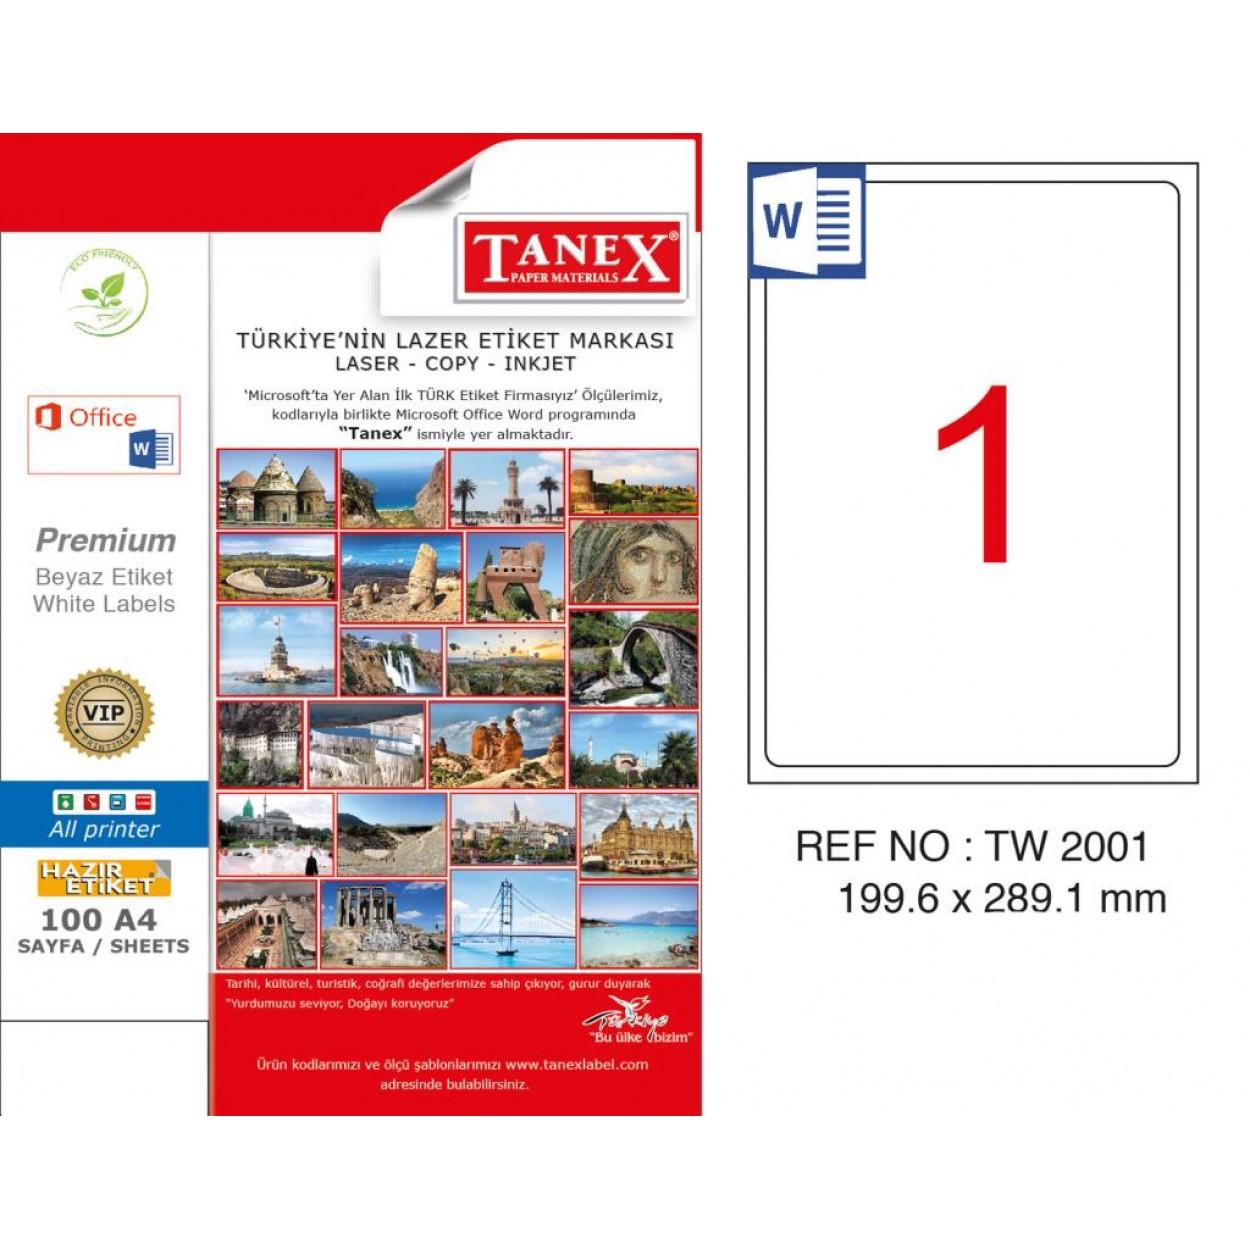 Tanex TW-2001 199.6x289.1mm Kuşe Laser Etiket 100 Lü